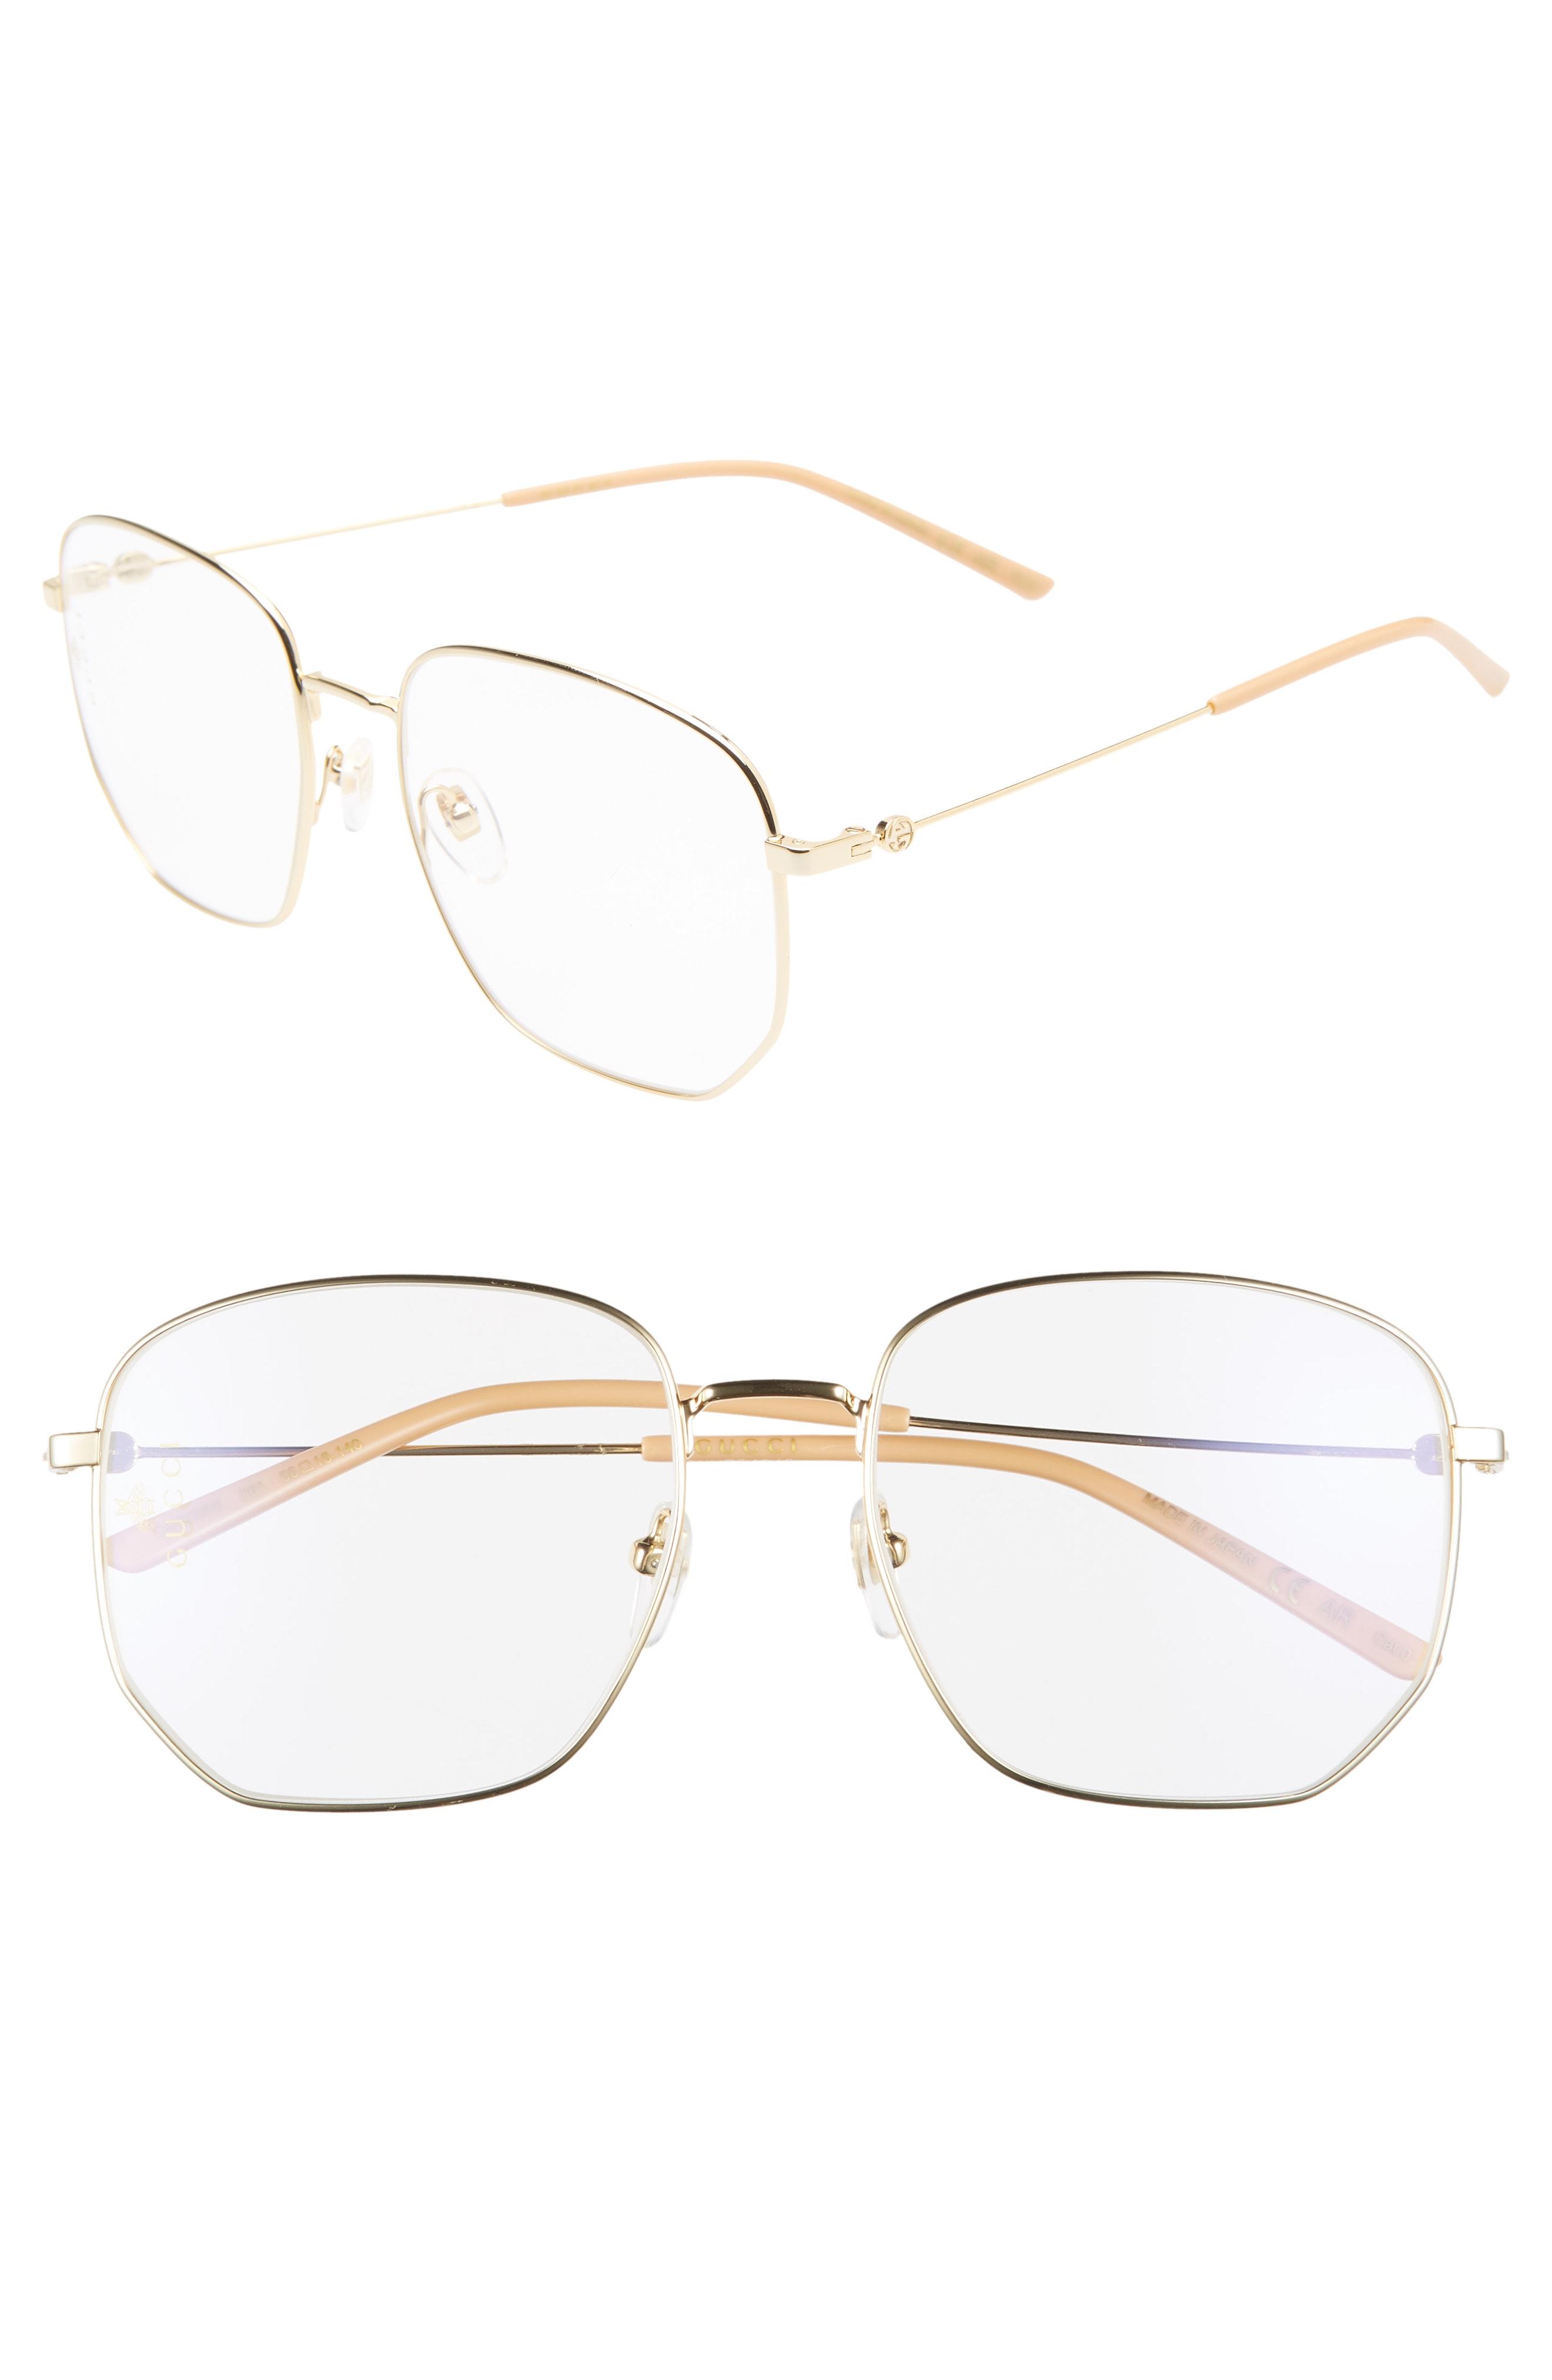 c83a32f205e Men s Gucci 56Mm Pilot Sunglasses – Gold  Clear